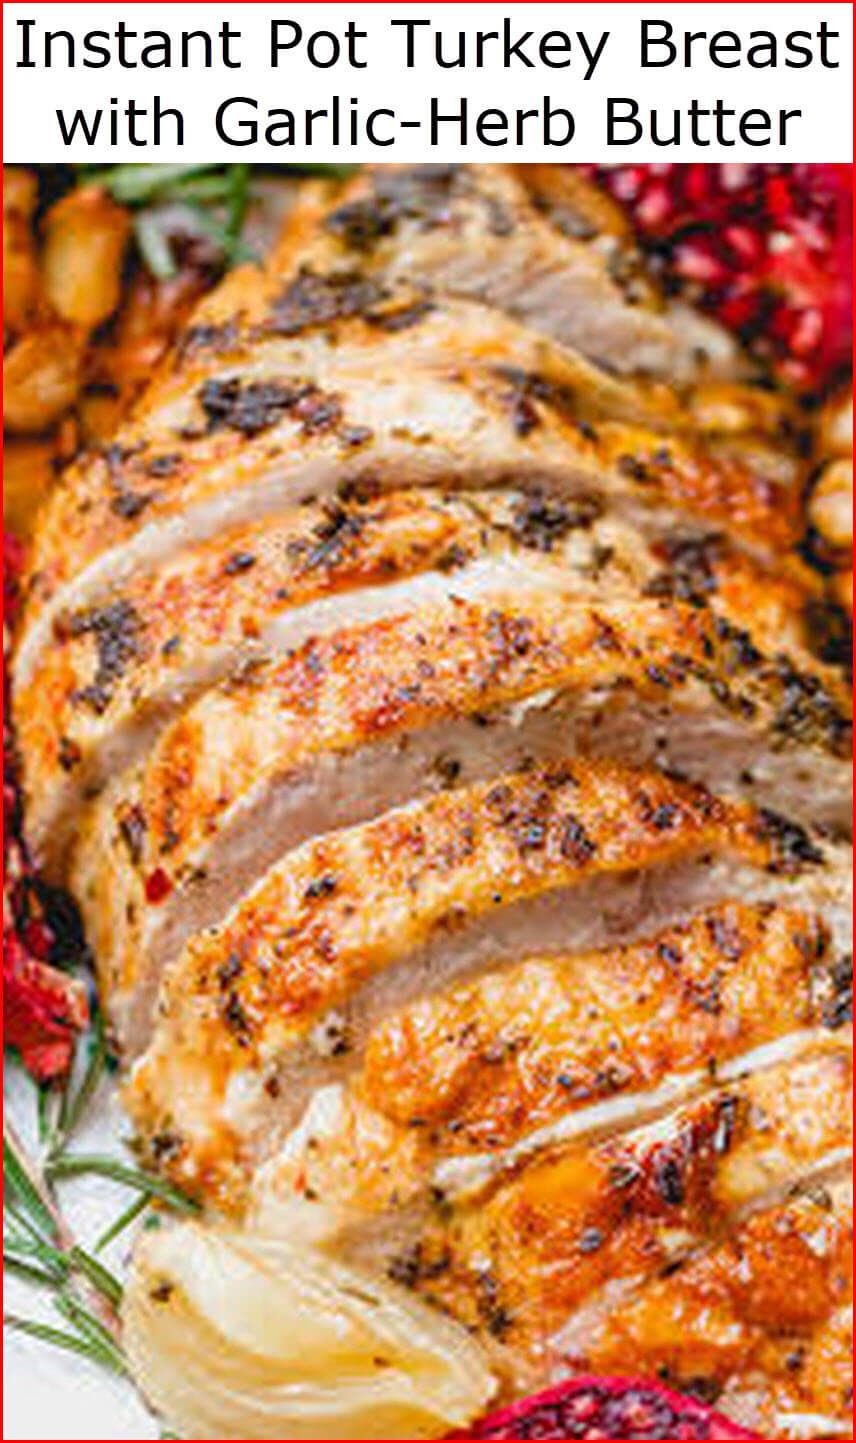 Photo of Instant Pot Recipes Turkey | Instant Pot Recipes – Most Popular And Easy Insta Pot Recipes